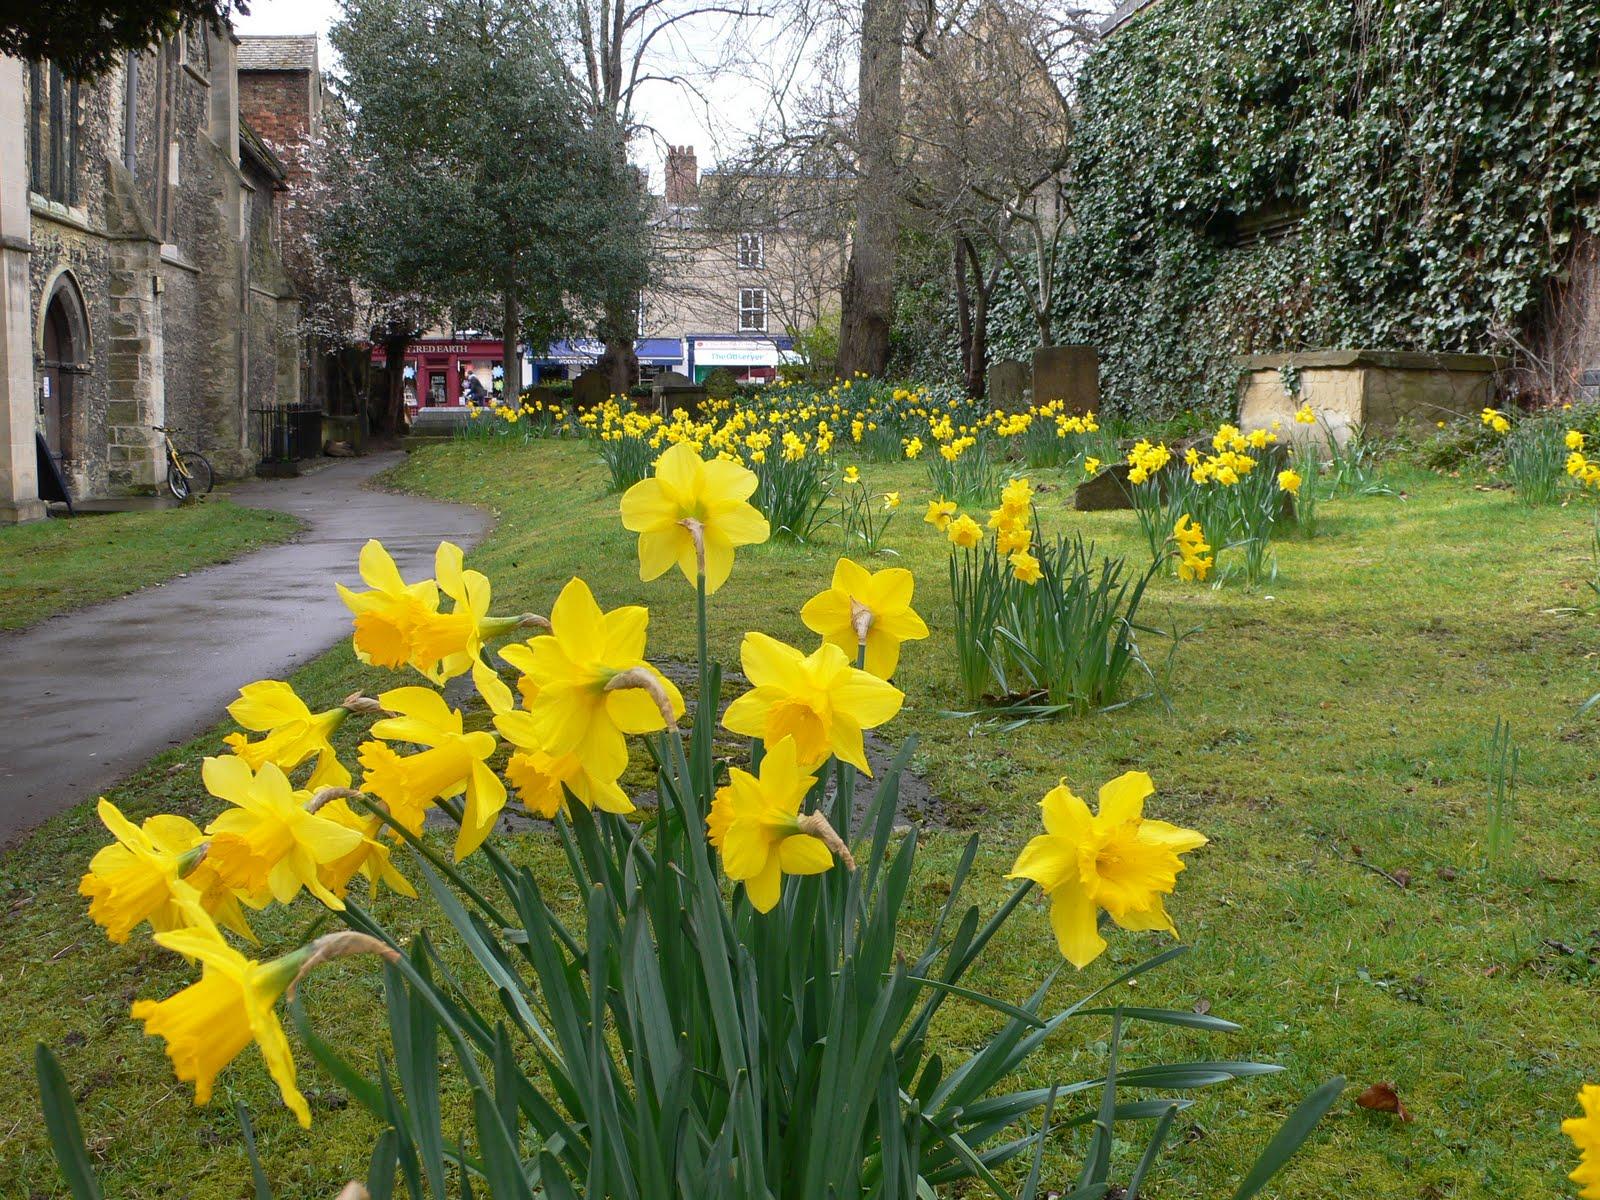 Daffodils in Oxford